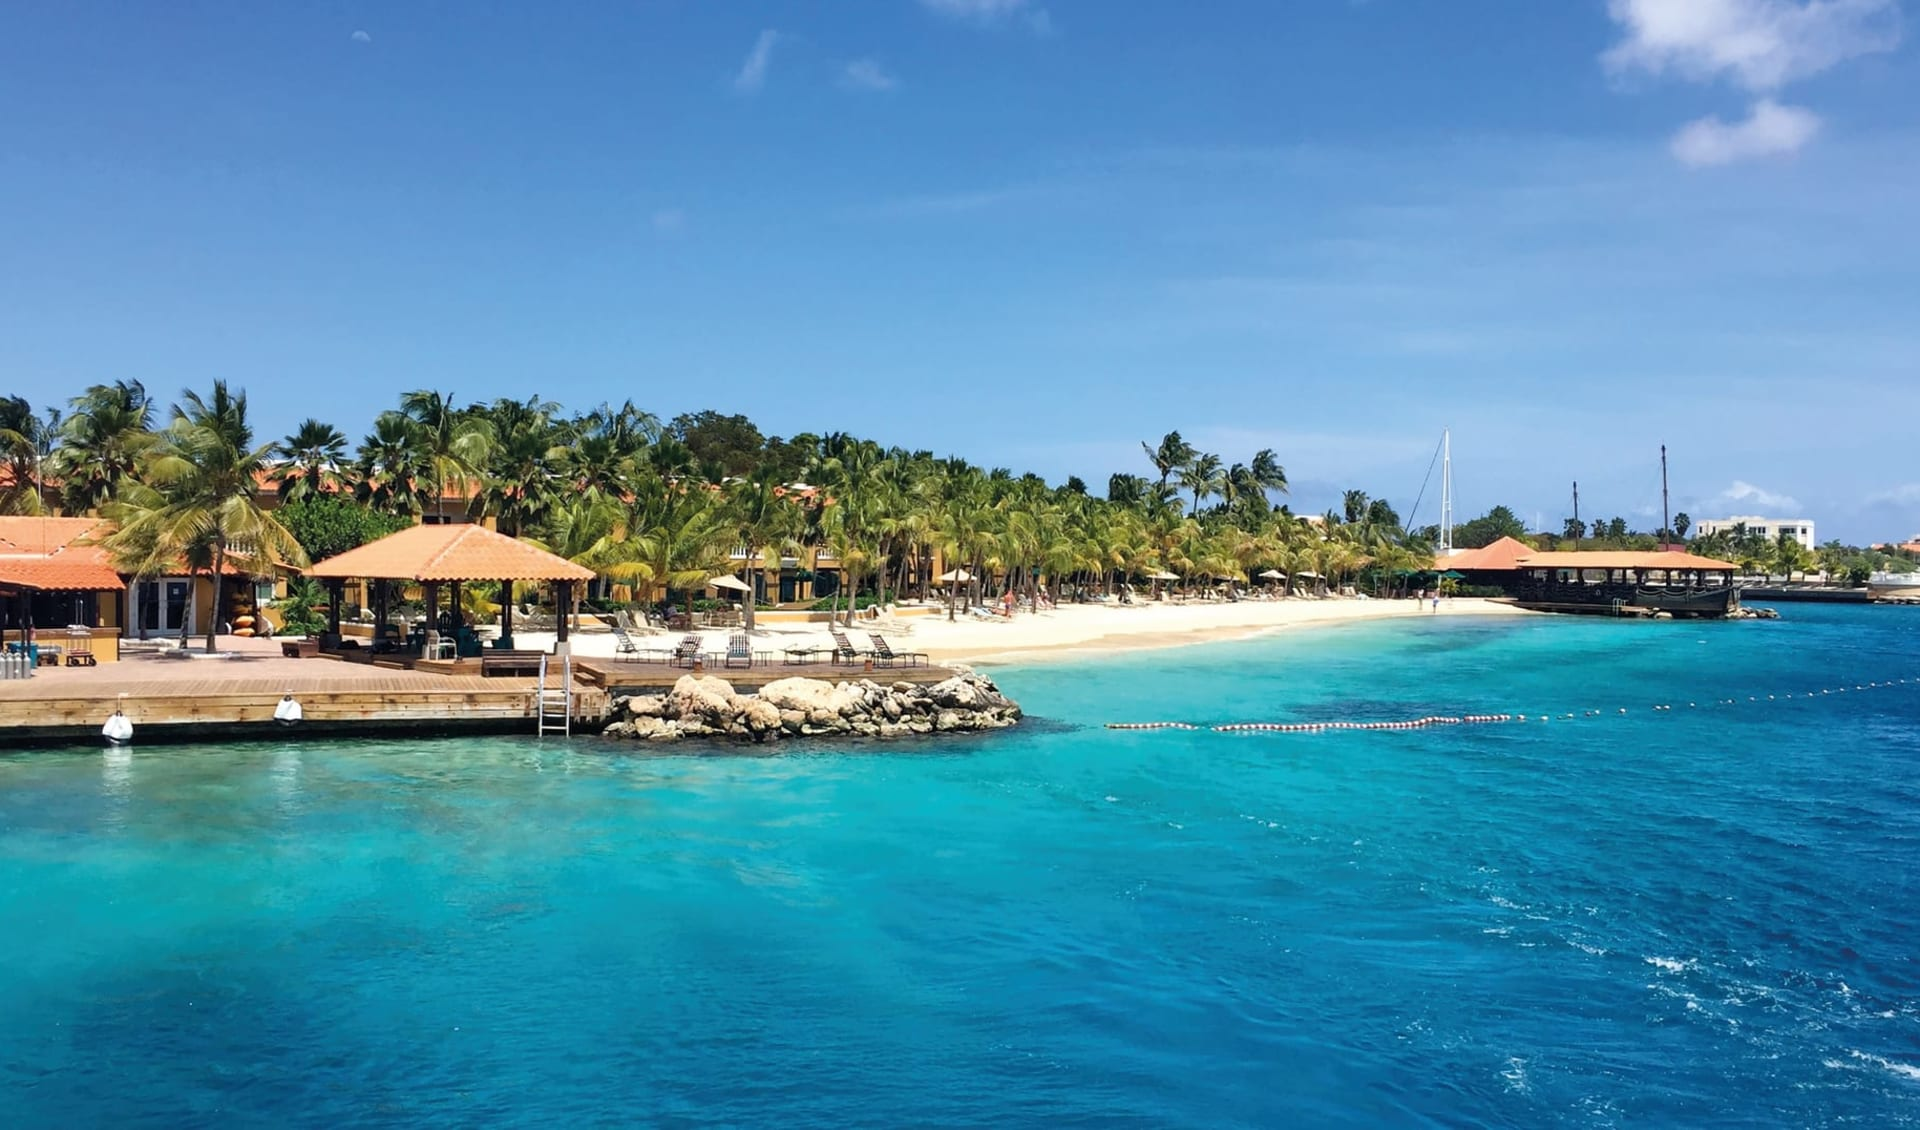 Harbour Village Beach Club Hotel in Bonaire:  Exterior Harbour Village Beach Club - Strandsicht C Harbour Village Beach Club